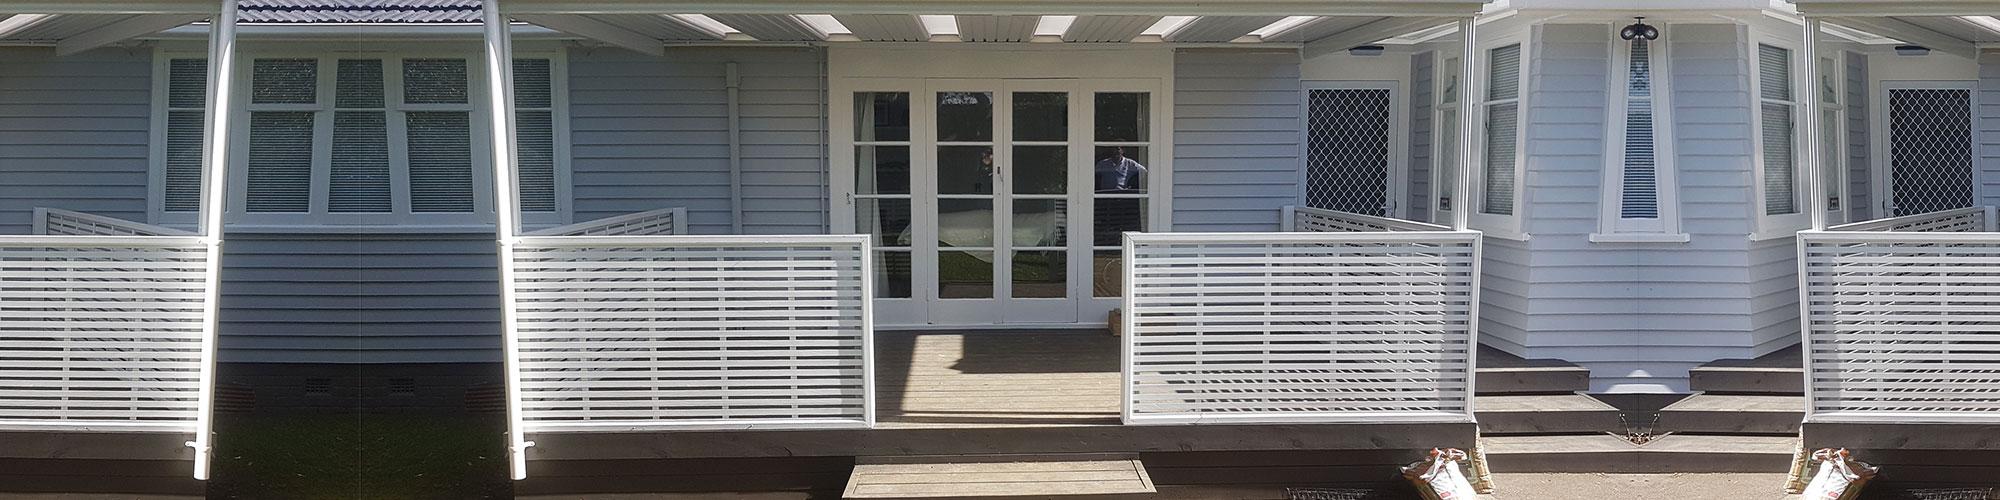 timber-trellis-balustrade-slider